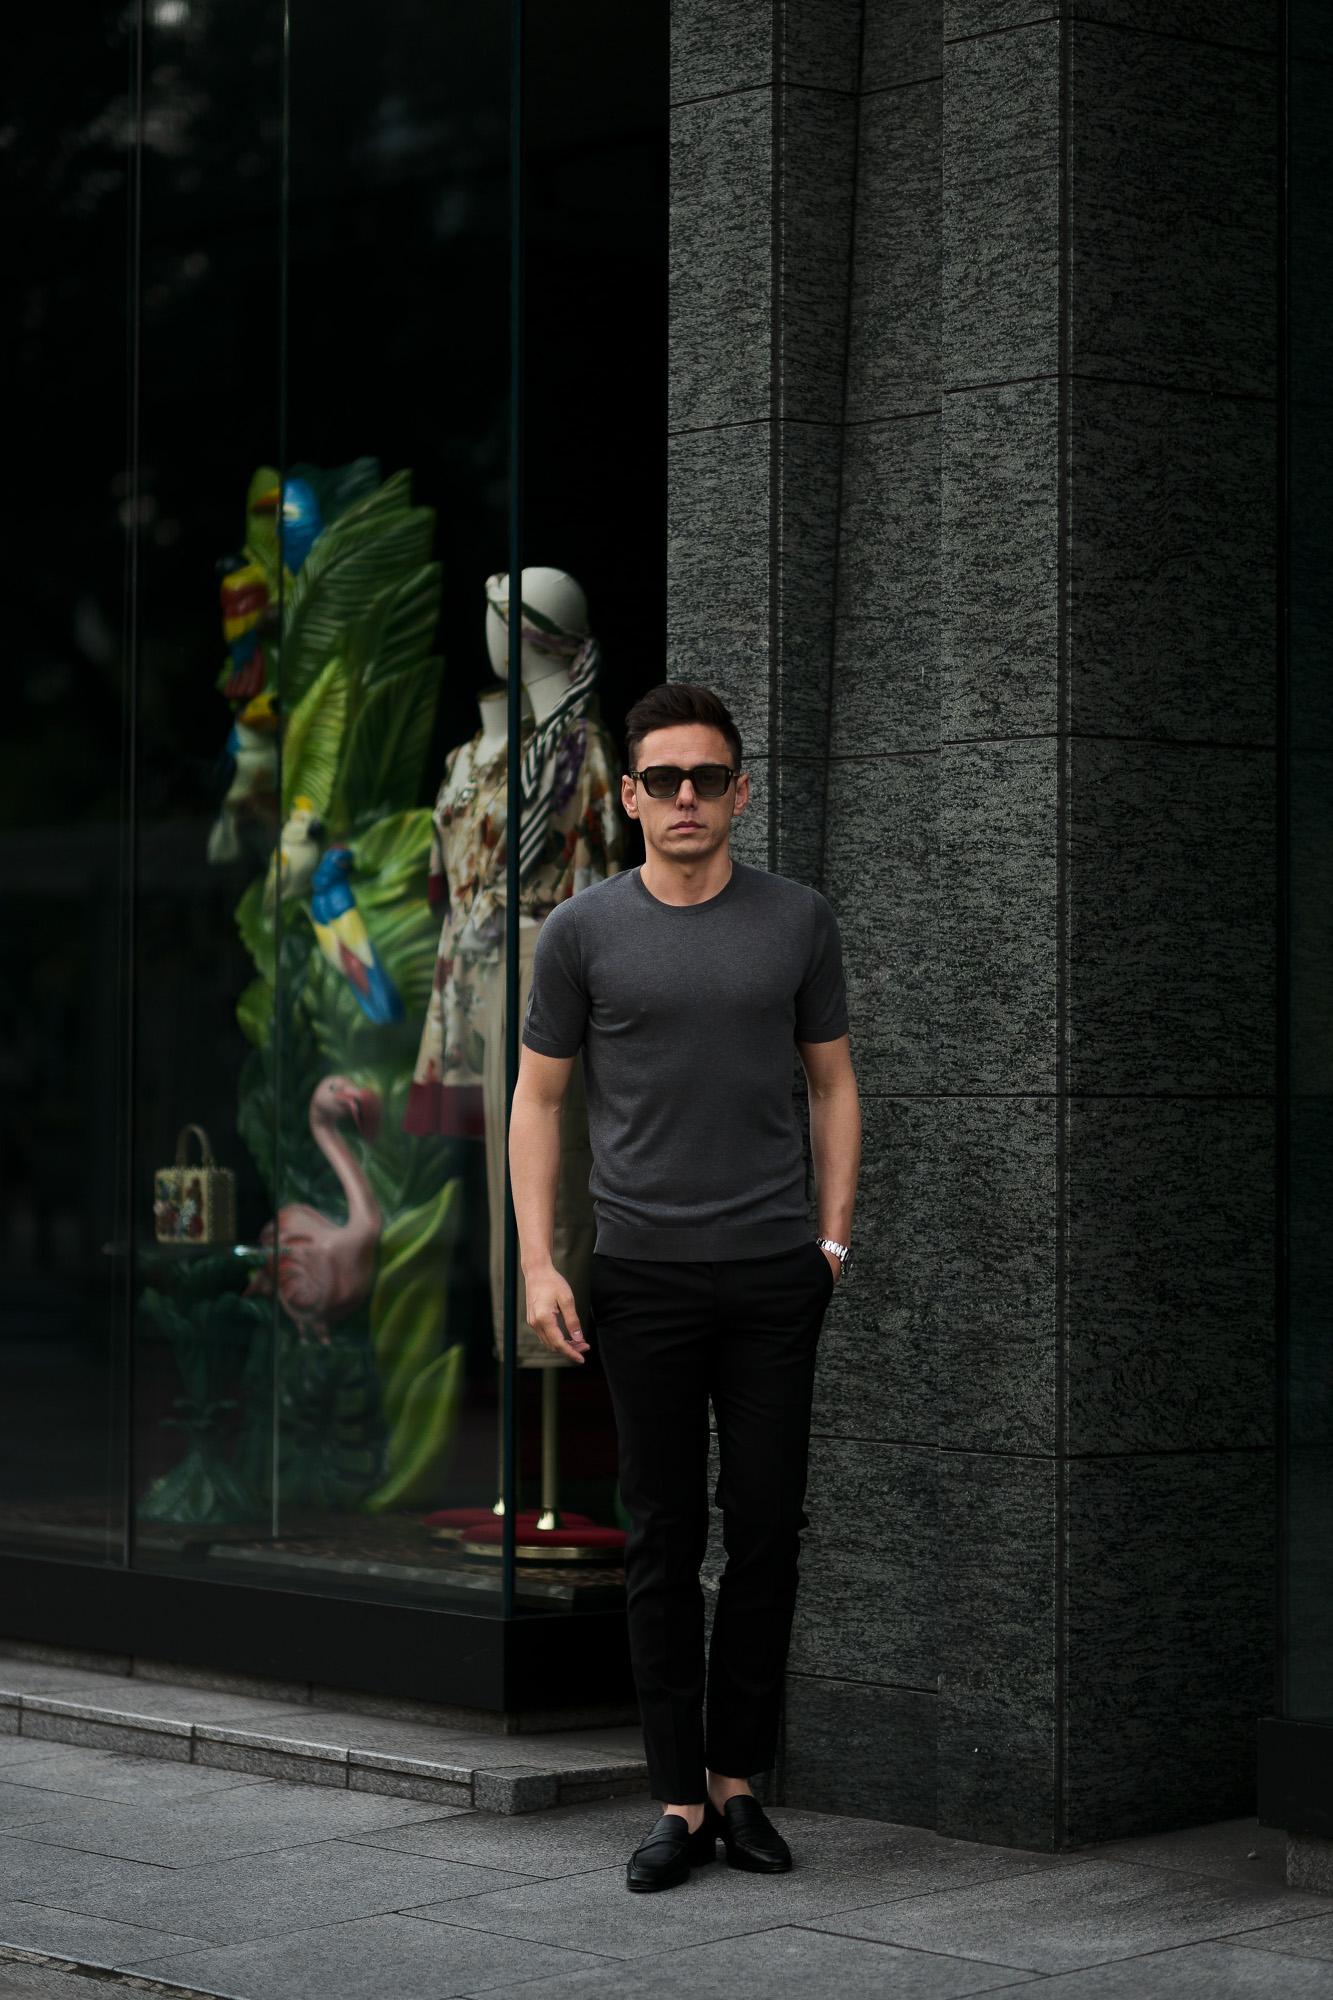 Gran Sasso (グランサッソ) Silk Knit T-shirt (シルクニット Tシャツ) SETA (シルク 100%) ショートスリーブ シルク ニット Tシャツ GREY (グレー・097) made in italy (イタリア製) 2020 春夏新作  gransasso 愛知 名古屋 altoediritto アルトエデリット